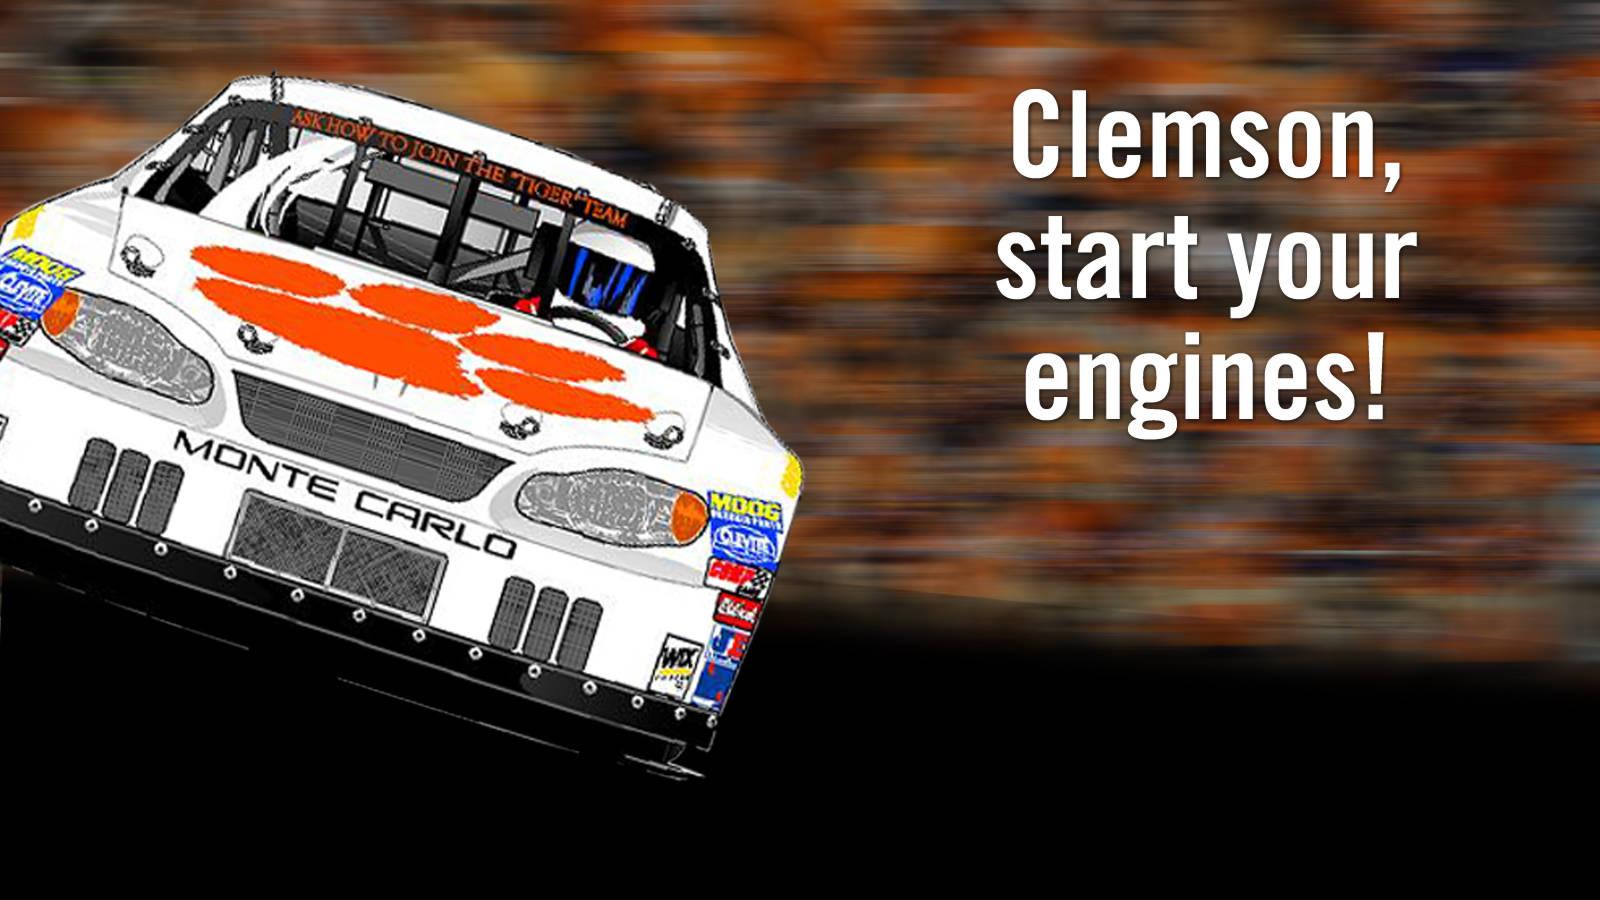 Clemson, Start Your Engines!